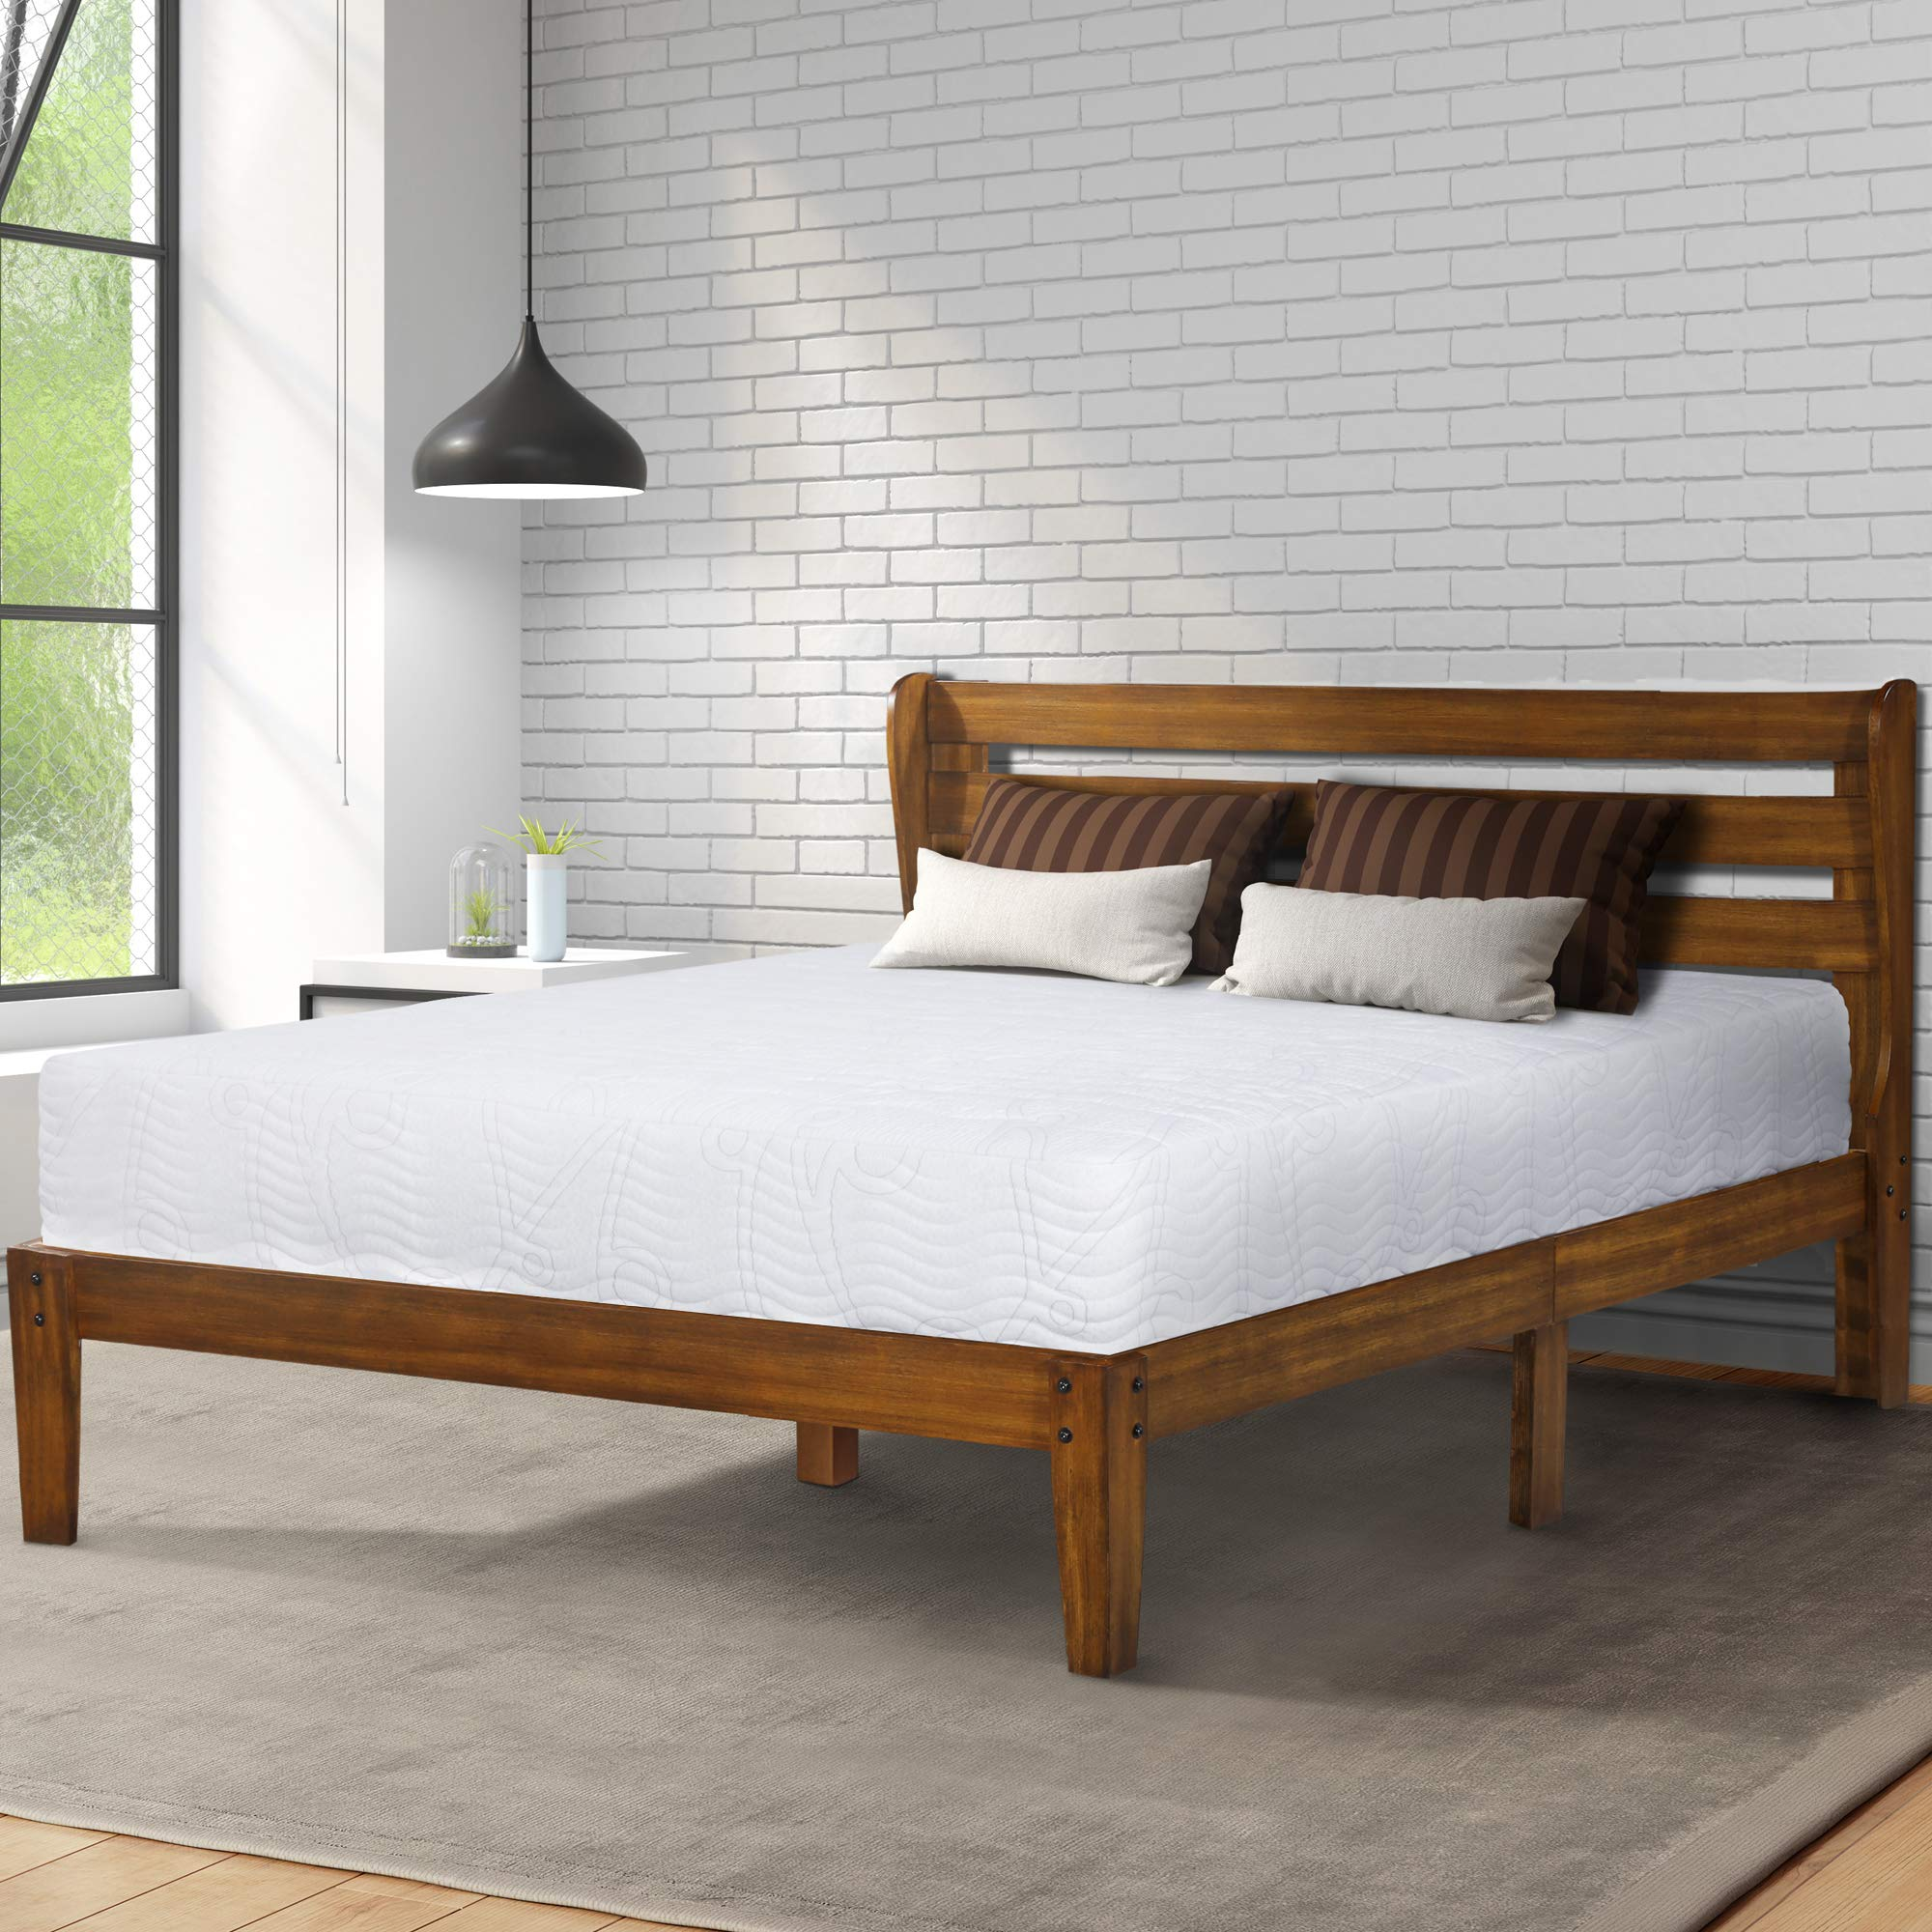 PrimaSleep PR40SF01F-1 Platform Headboard Bed Frame/Wood Support, Full, Brown